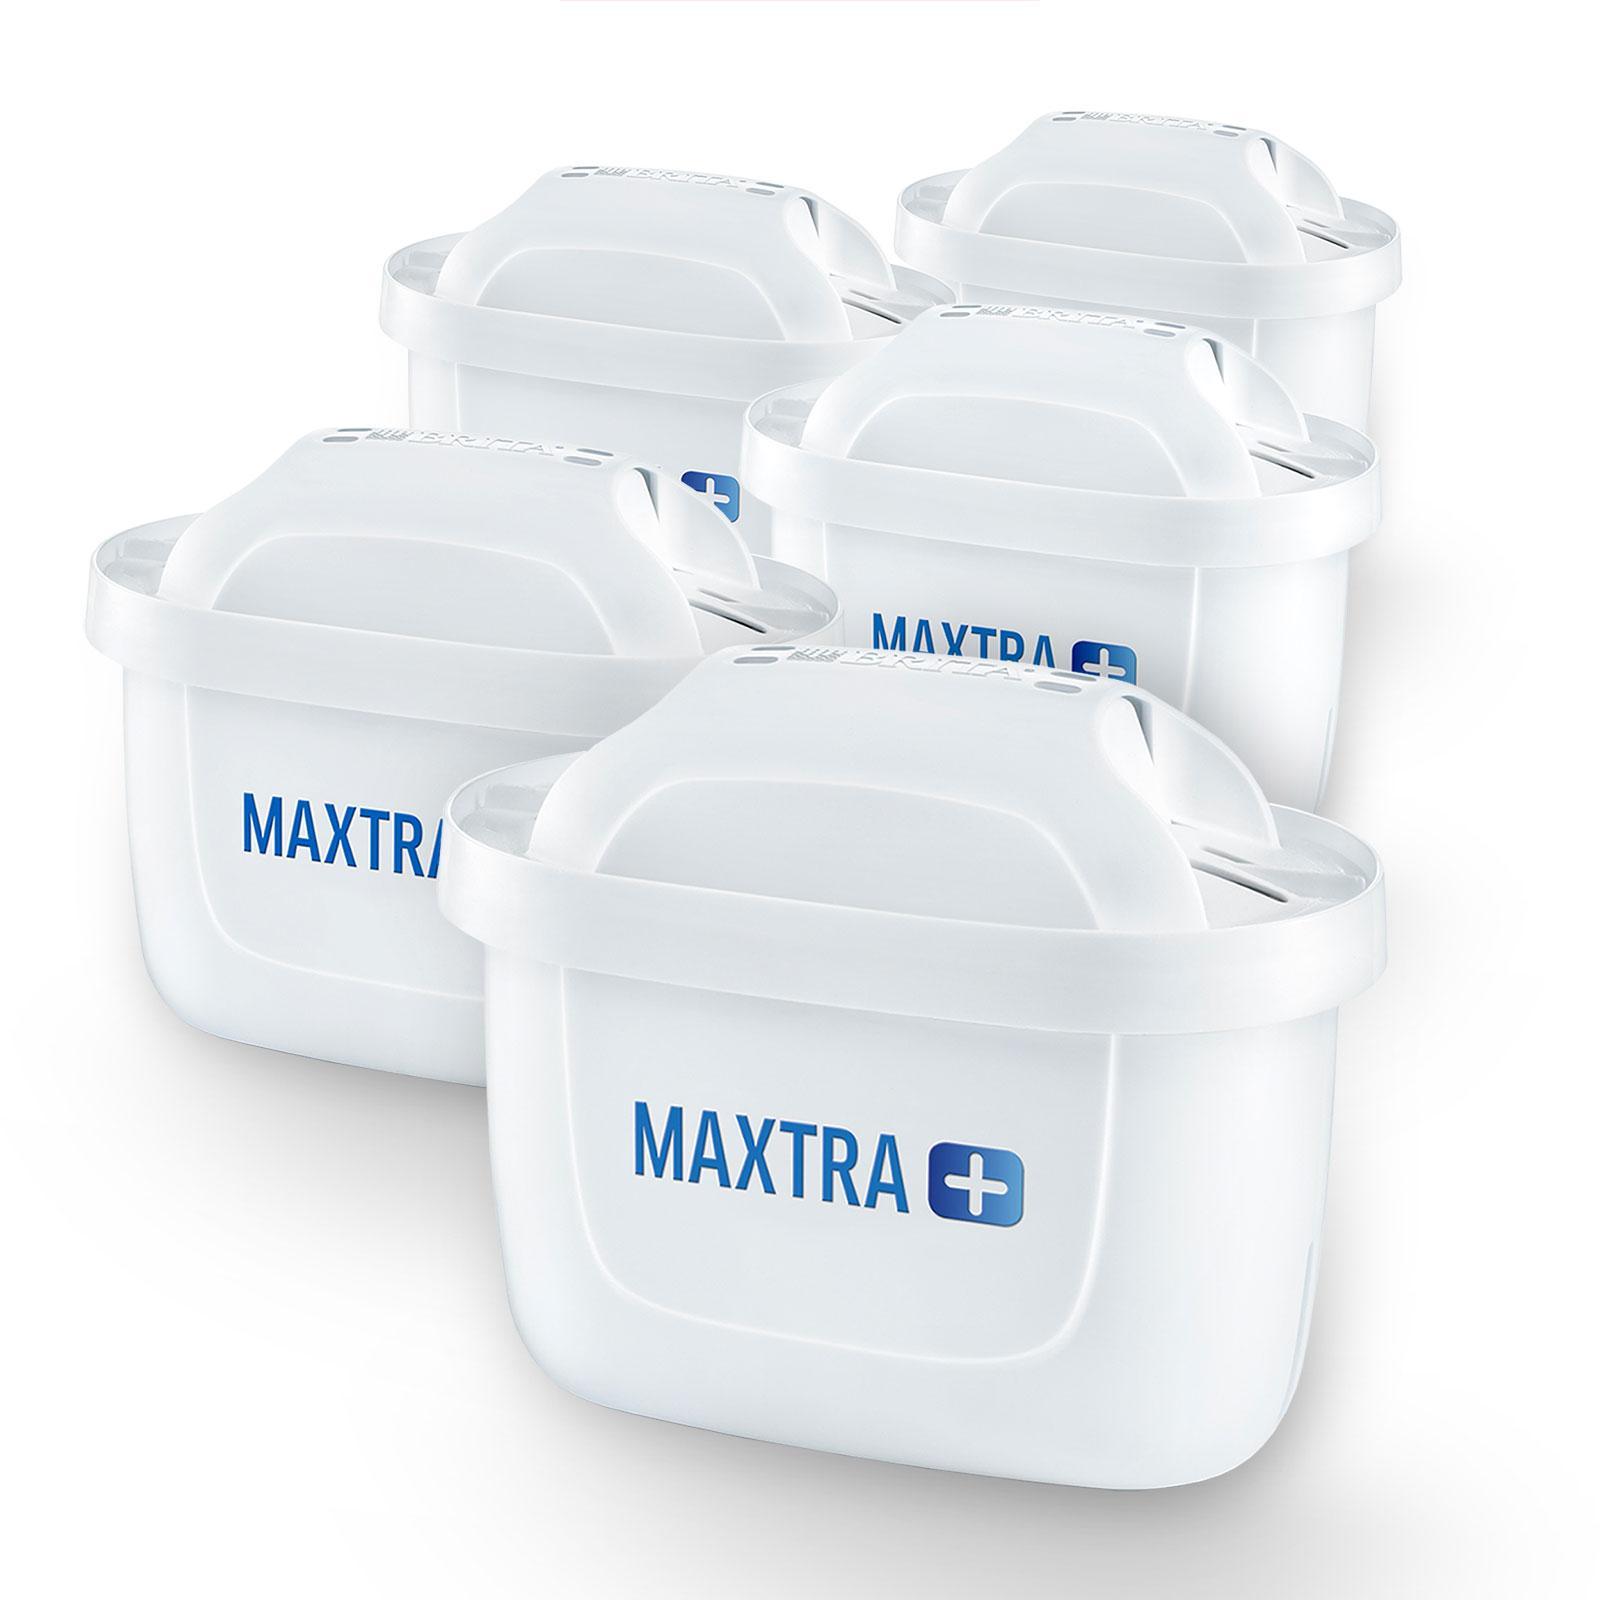 5x Brita Maxtra + , originale Maxtra plus Kartusche